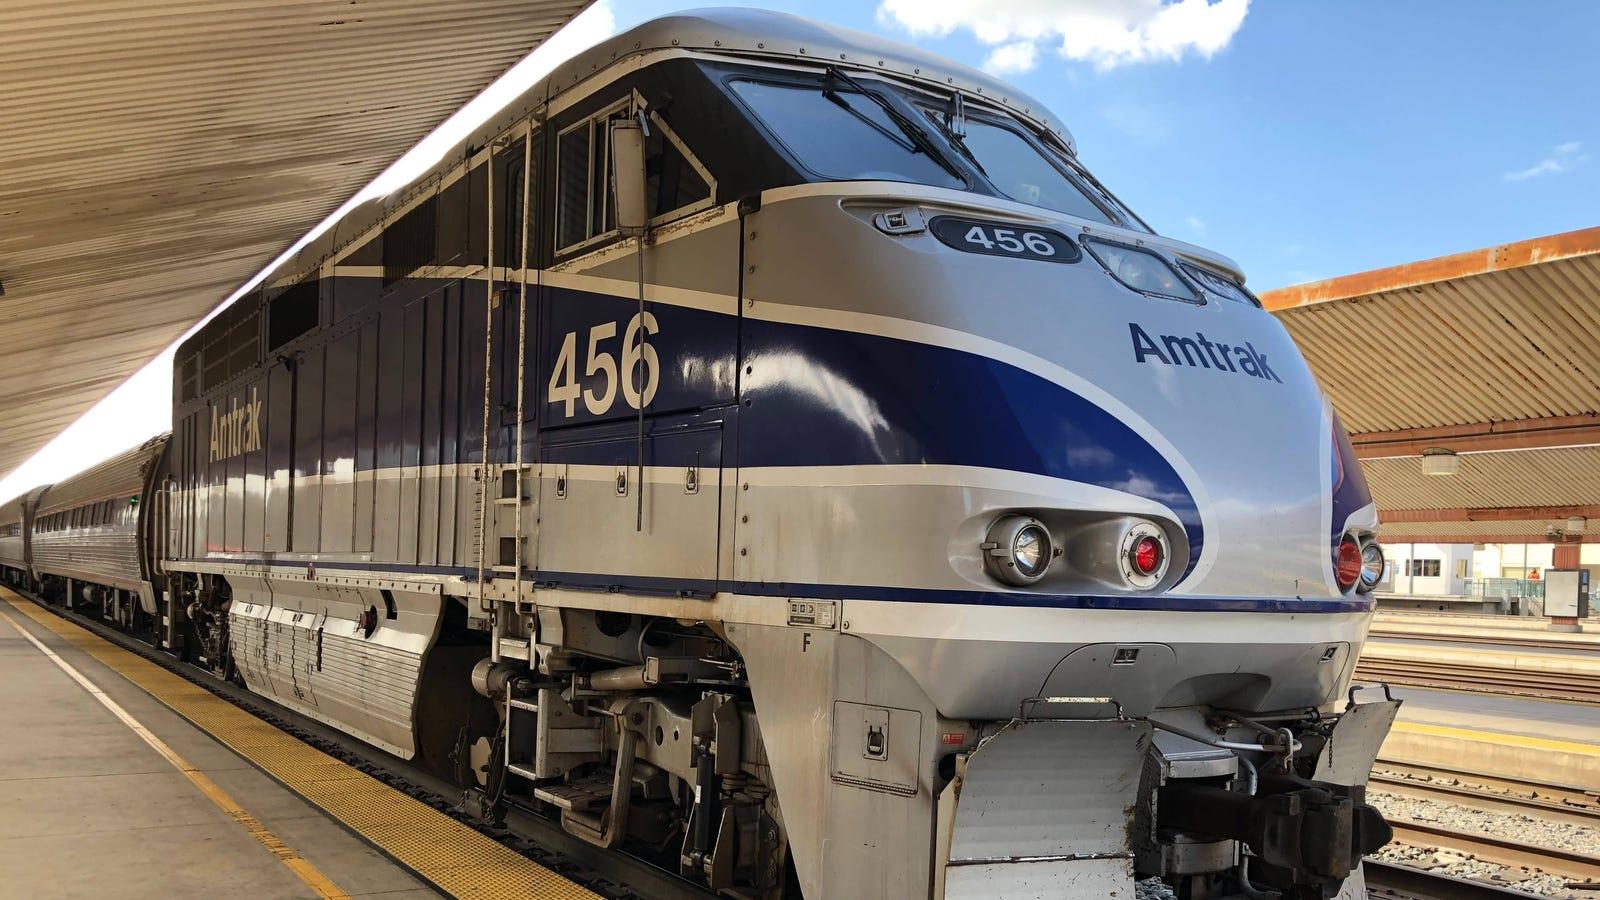 Get 50% Off September Train Travel During Amtrak's Sale